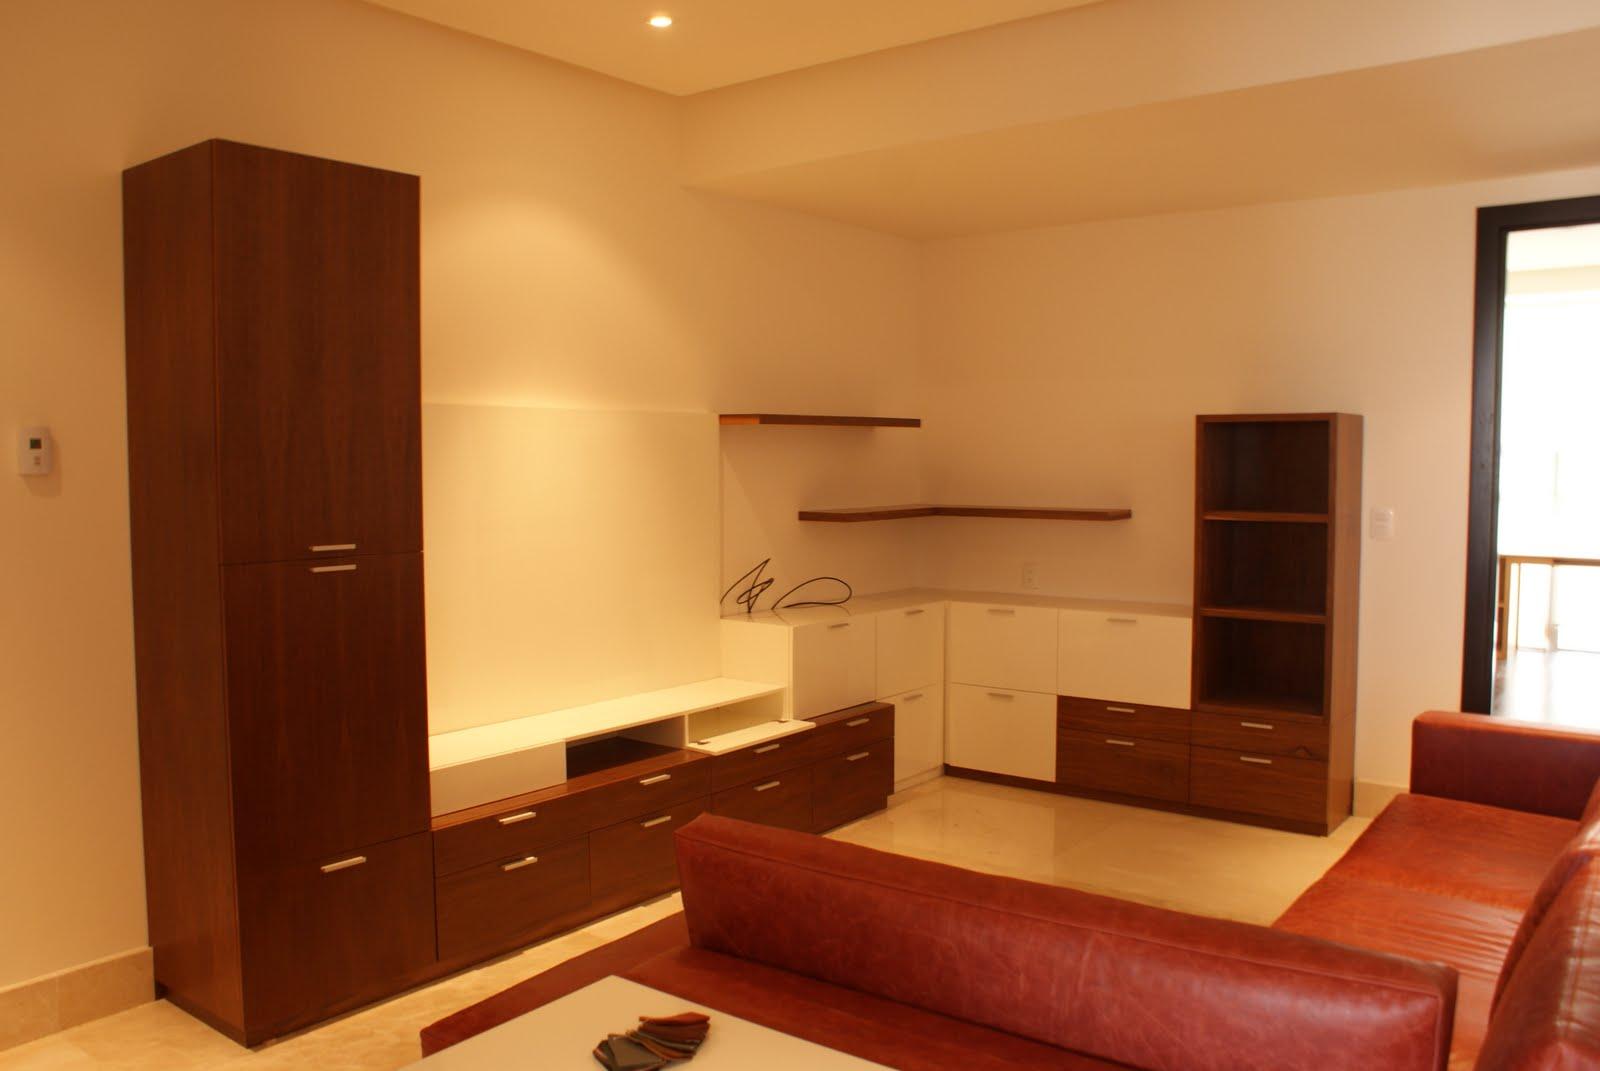 Muebles sobre dise o avl muebles para t v for App diseno de muebles